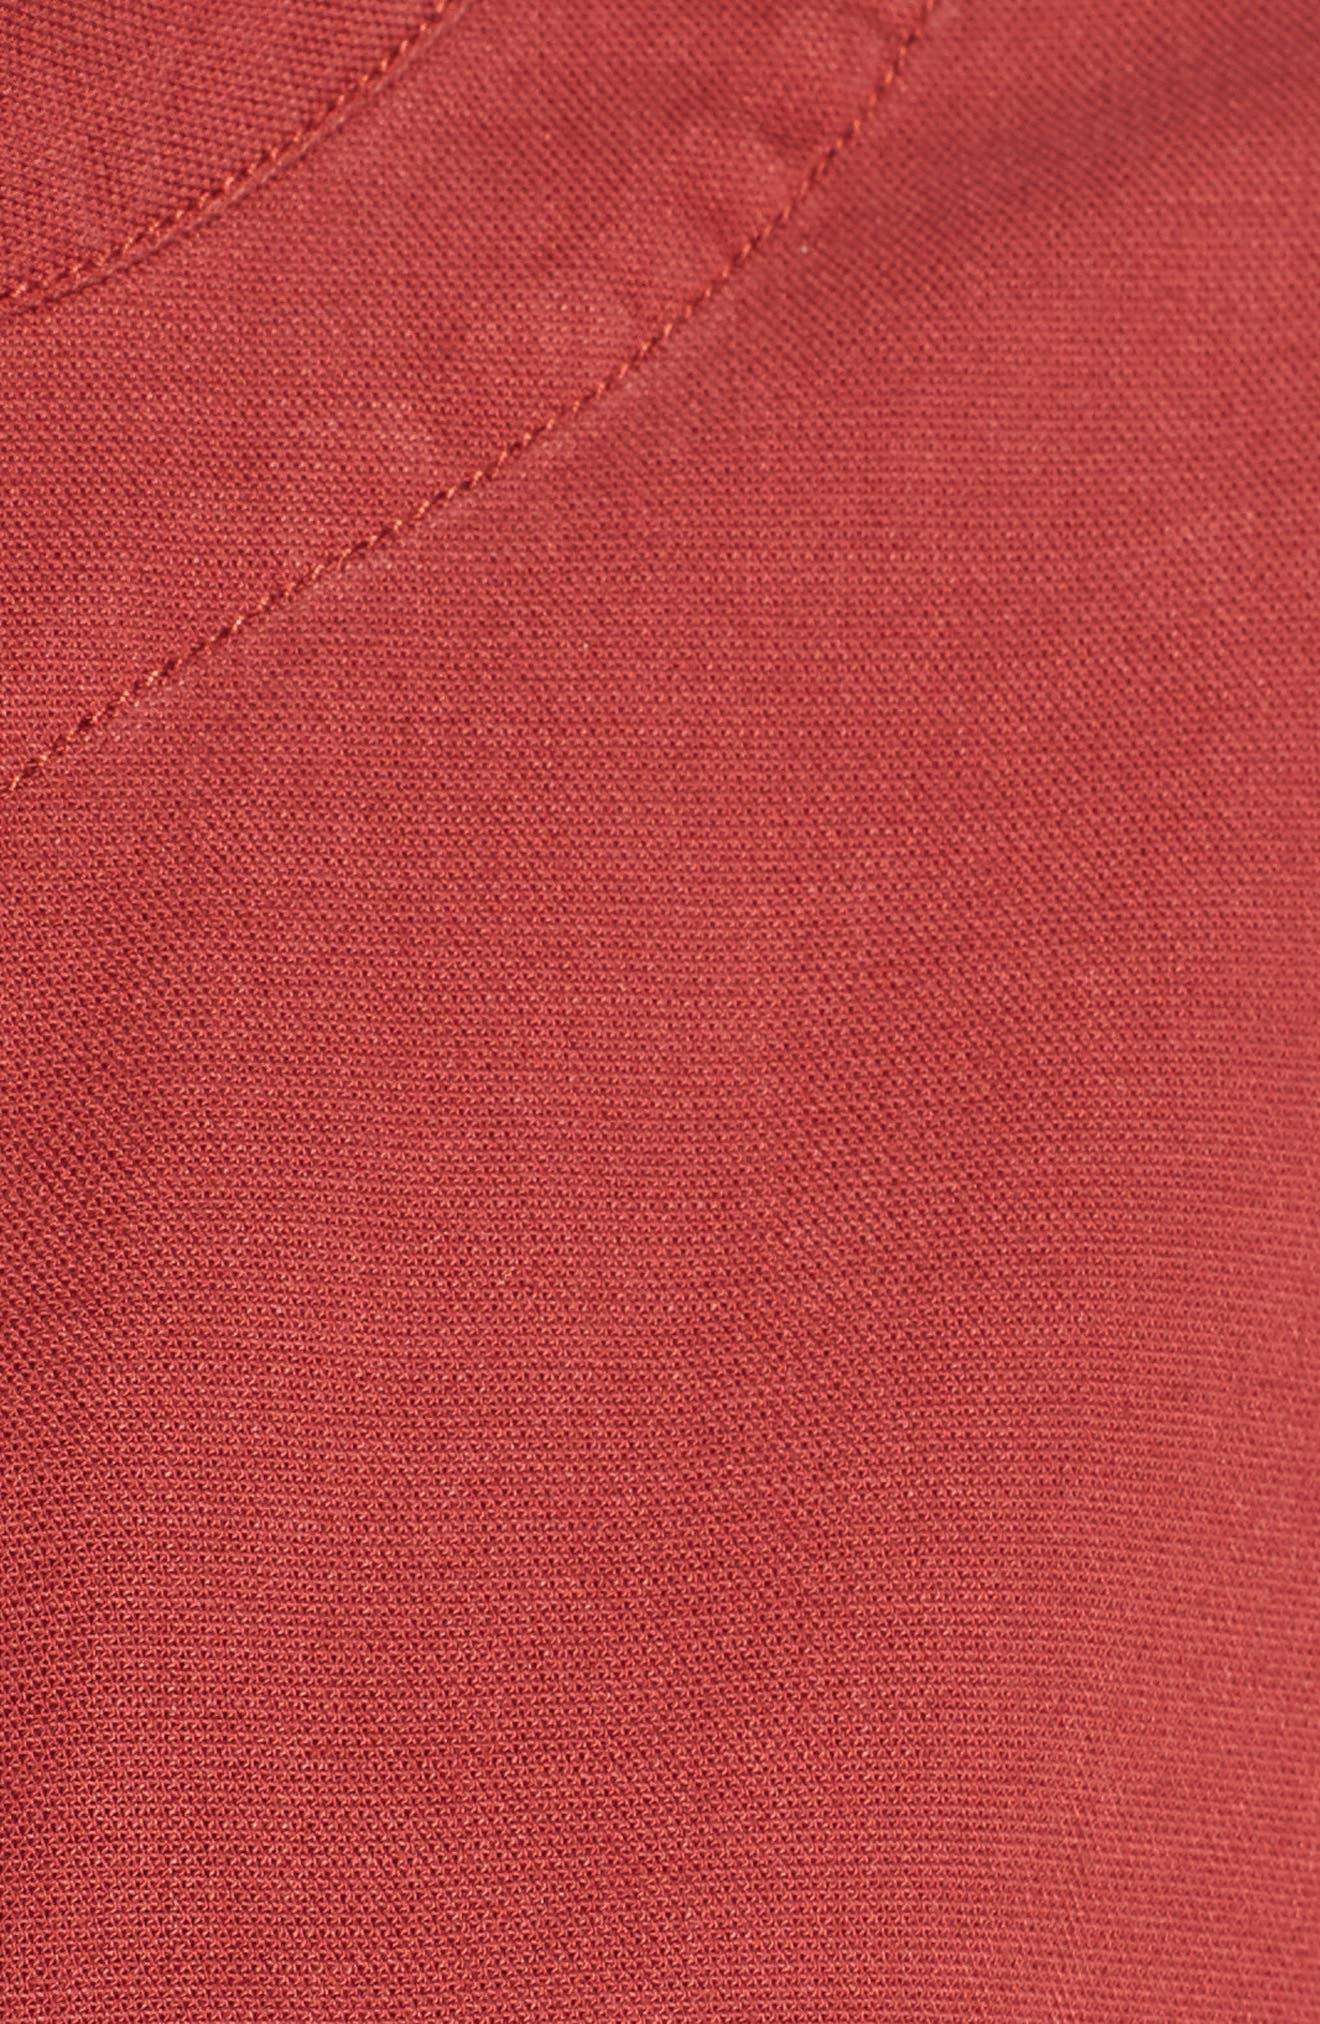 Cargo Jacket,                             Alternate thumbnail 5, color,                             Rhubarb